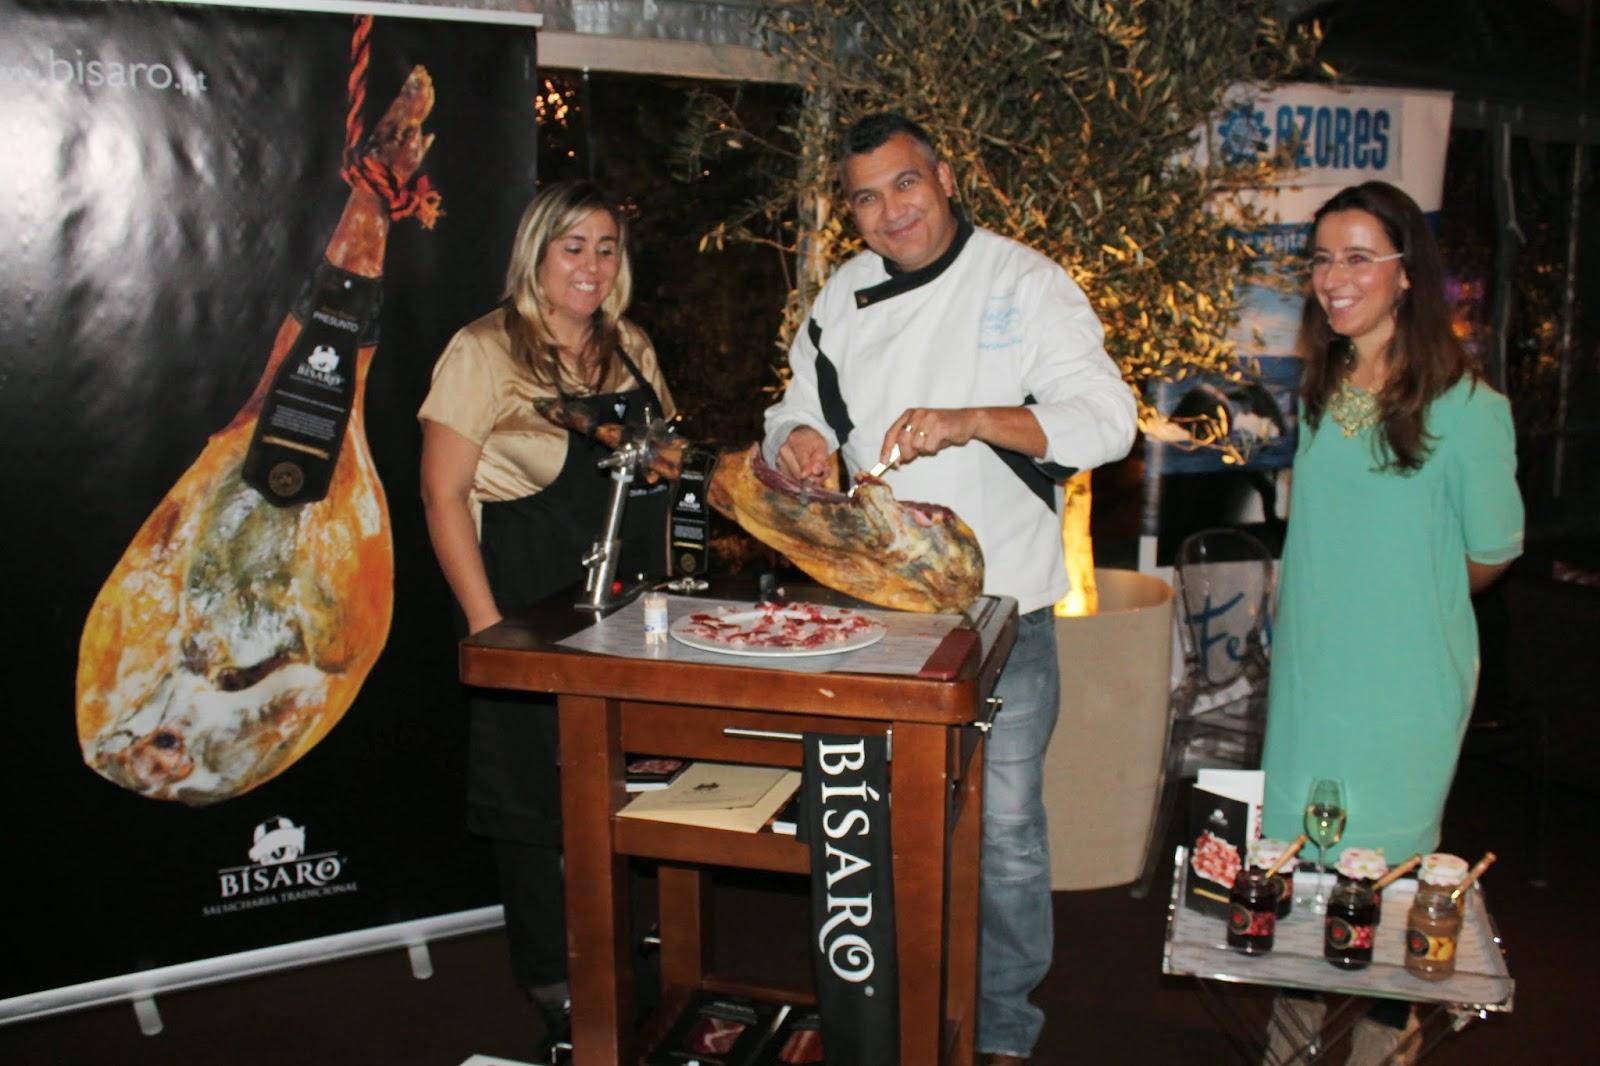 chef leonel pereira presunto porco bísaro